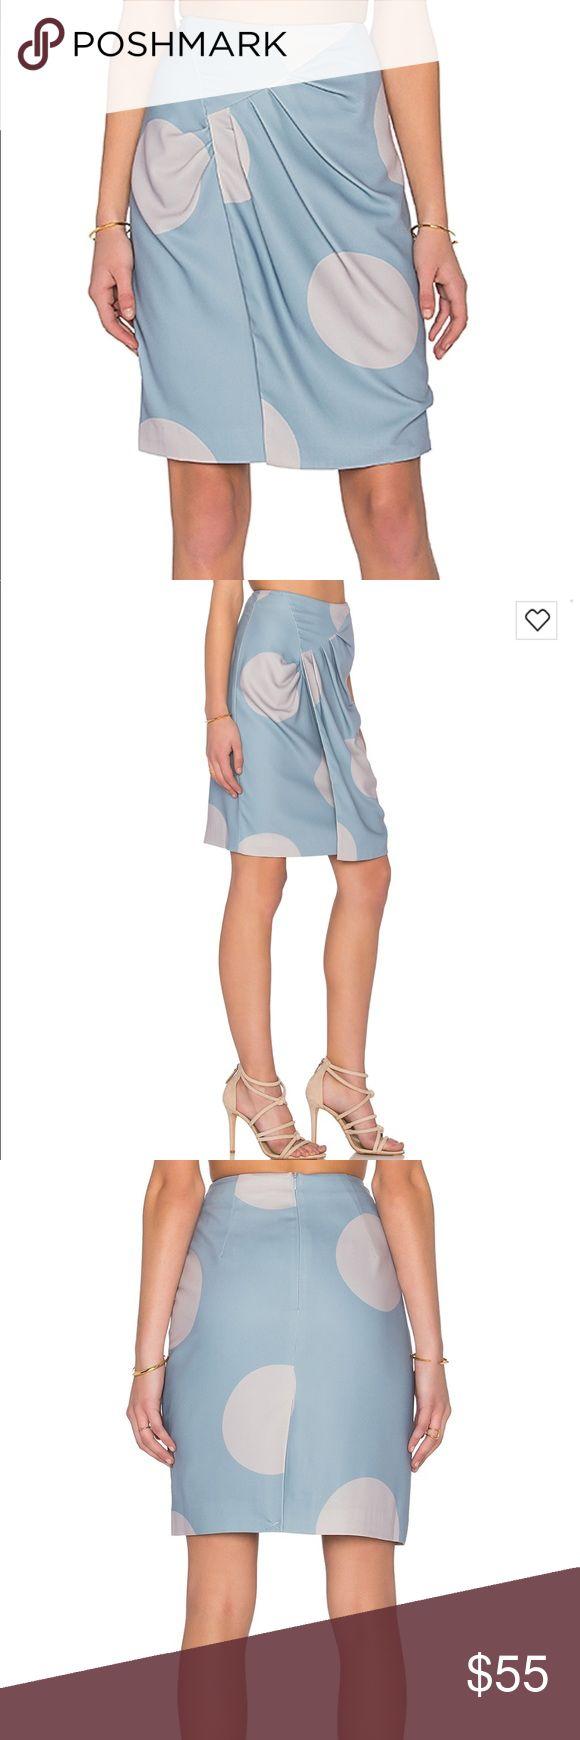 "TY-LR The Dot Discovery Skirt in Grey & Duck Egg Brand new, never worn!! Waist 14"" flat across, hip 18"", 22"" long TY-LR Skirts Midi"